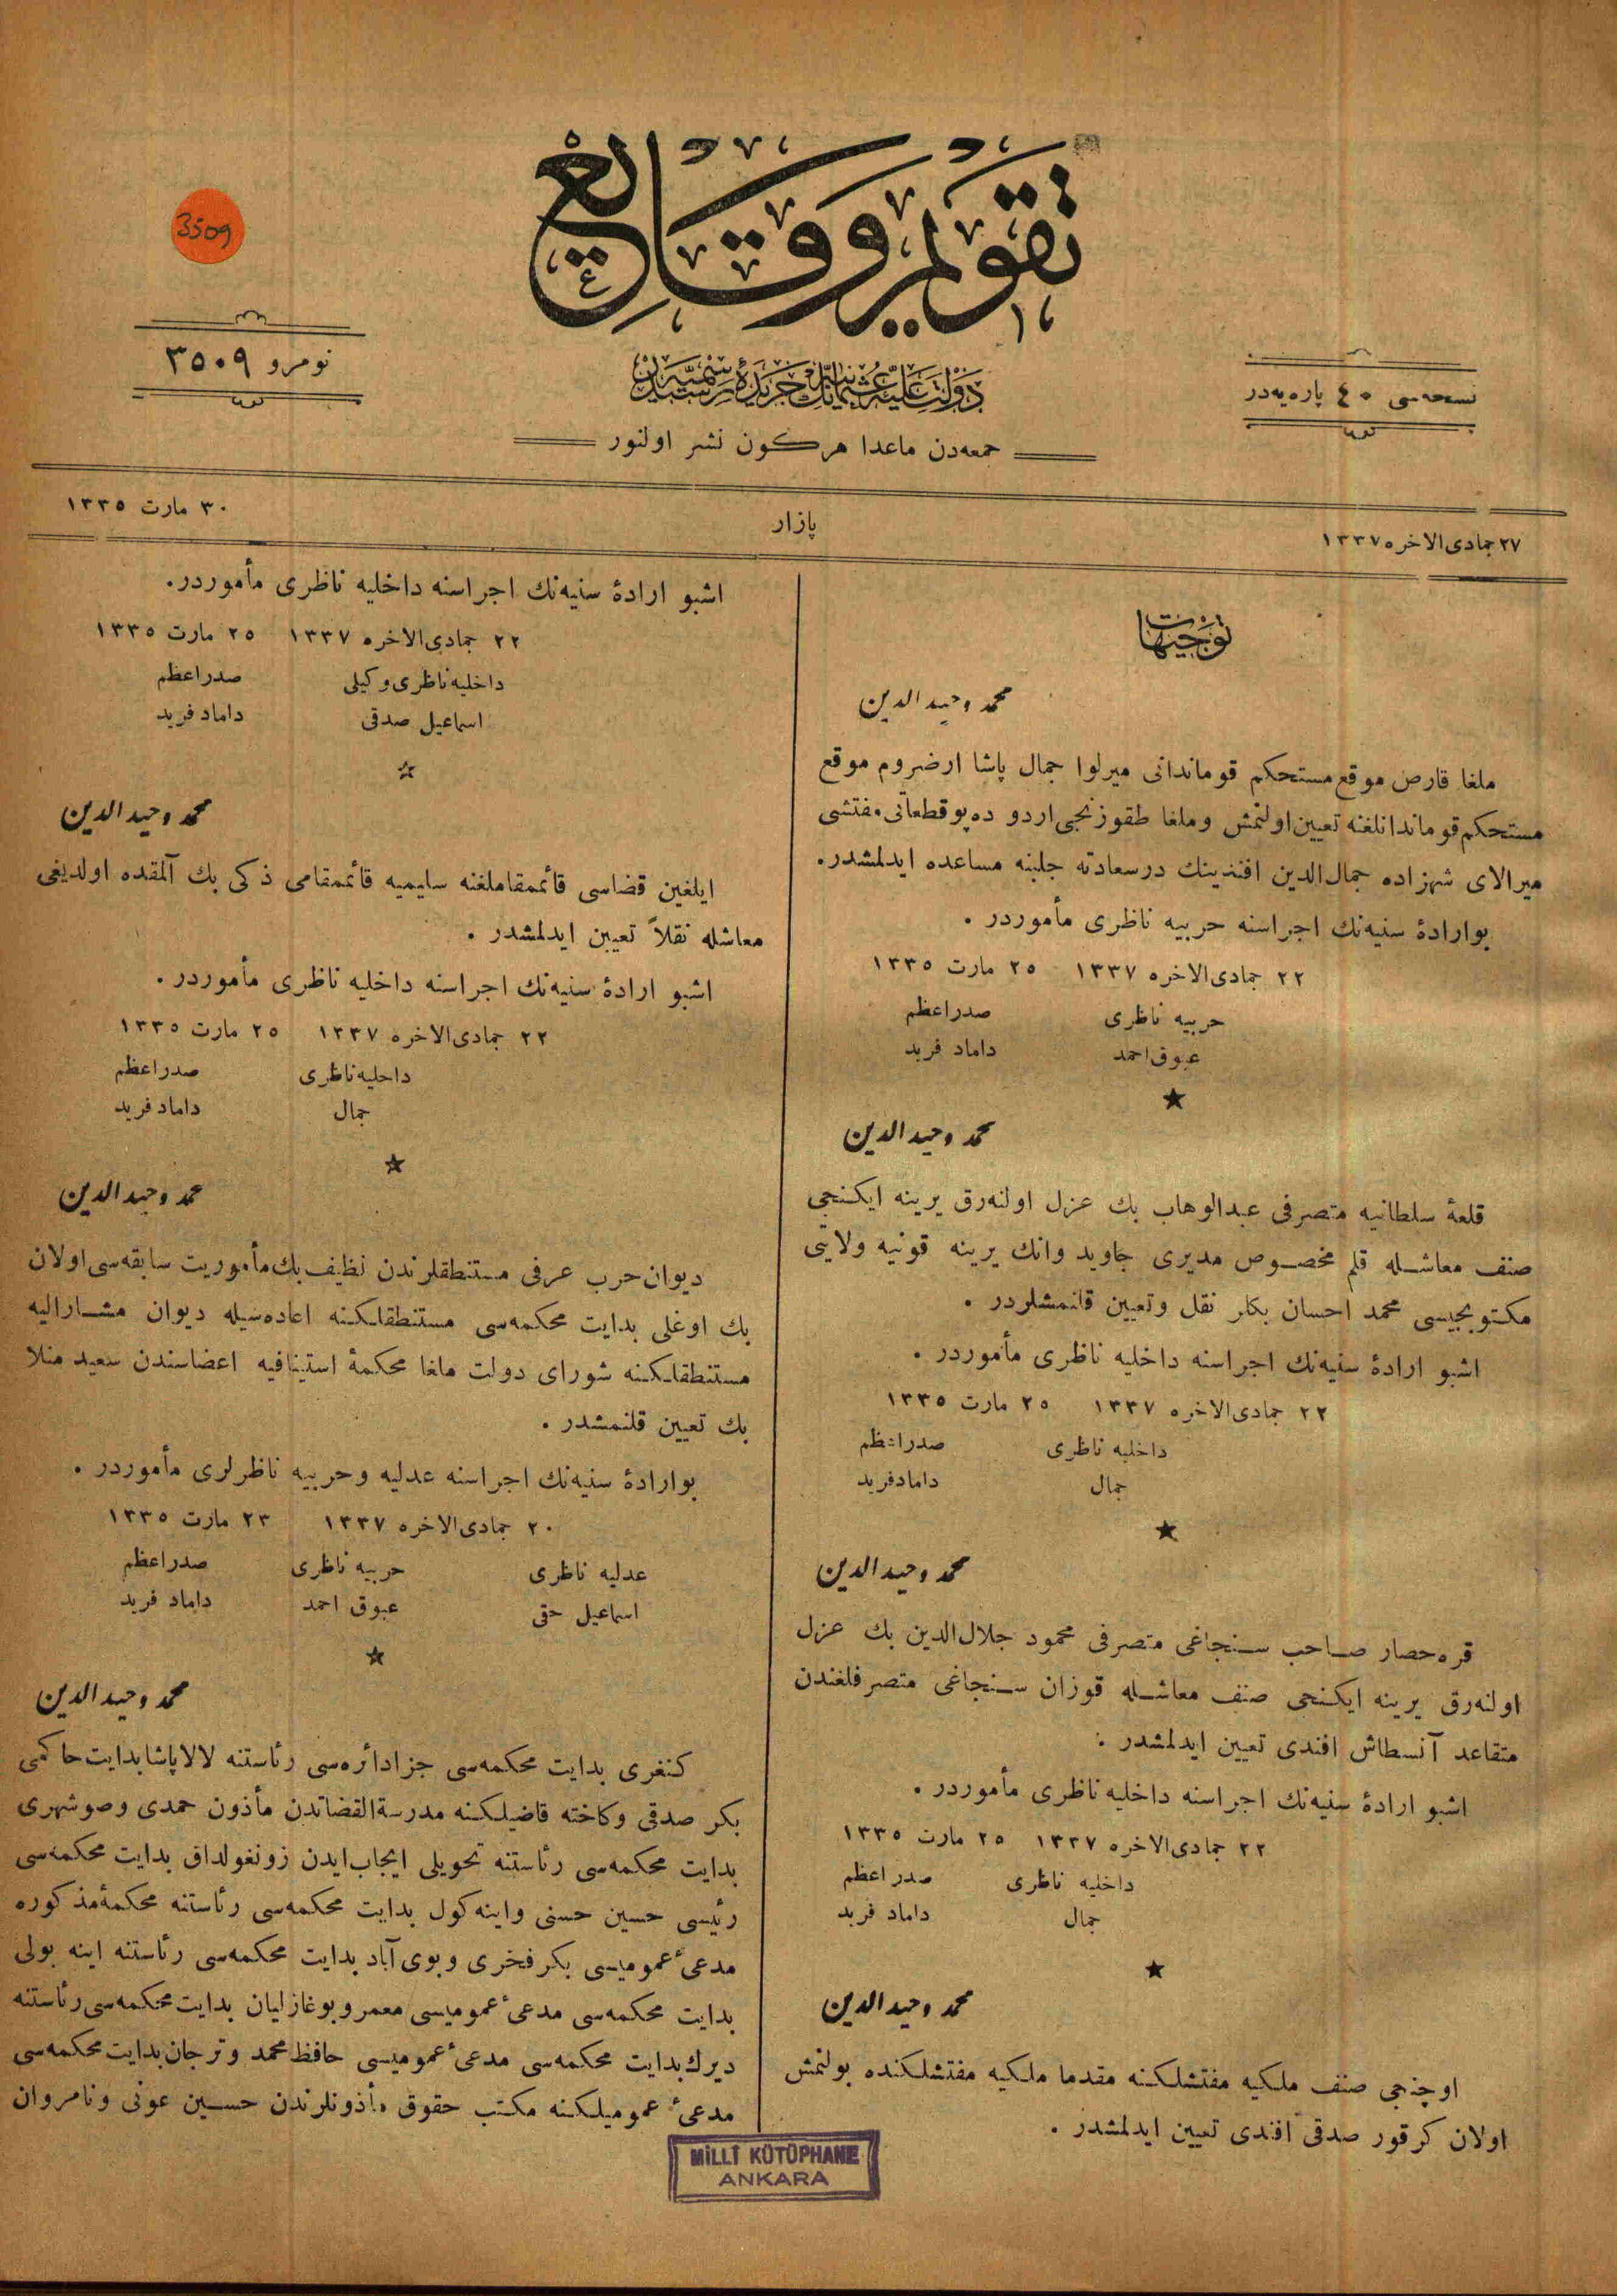 30 Mart 1919 Tarihli Takvim-i Vekayi Gazetesi Sayfa 1